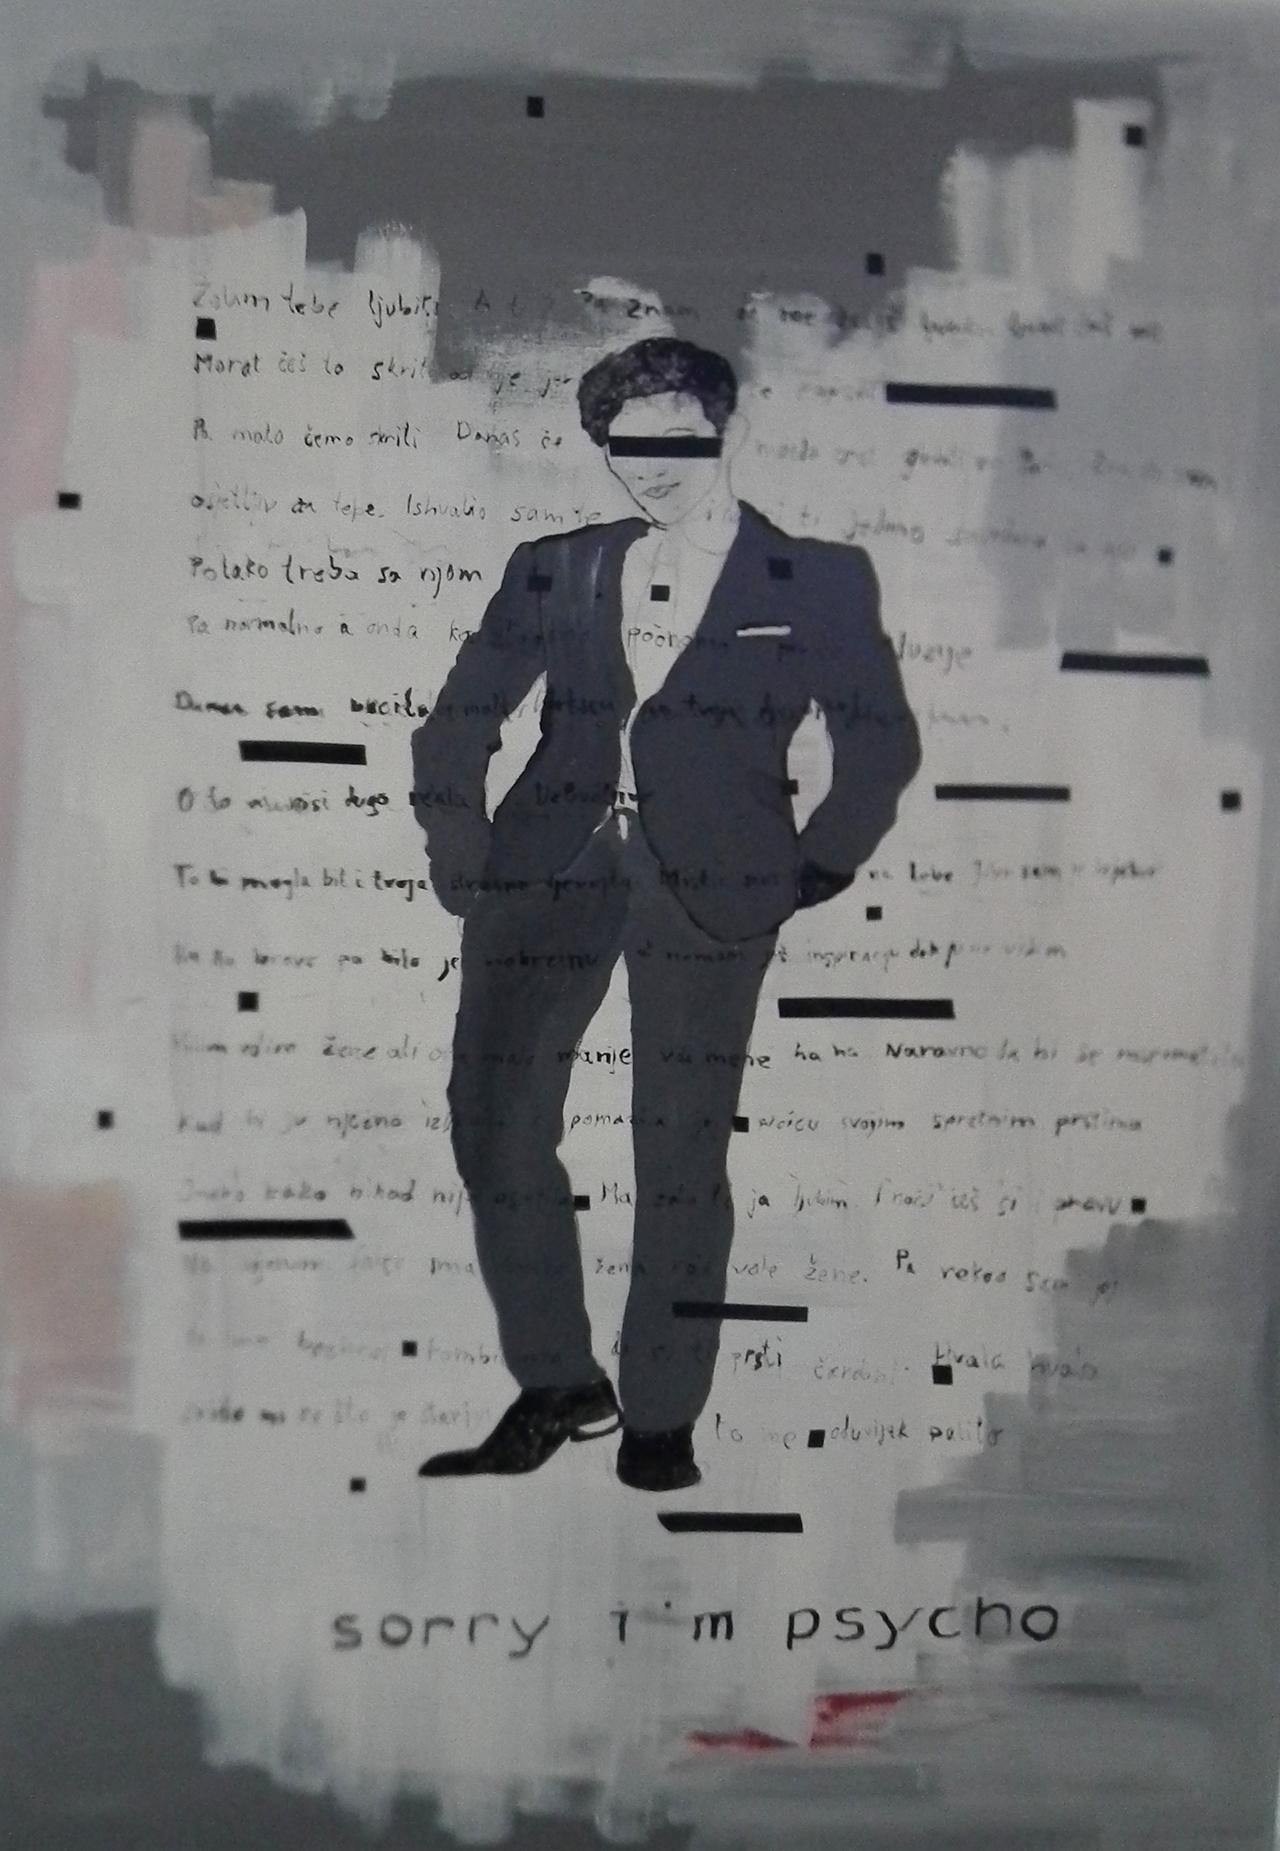 Paulina Jazvić, Sorry I am psycho, oil and acrylic on canvas, 180x130cm, 2014